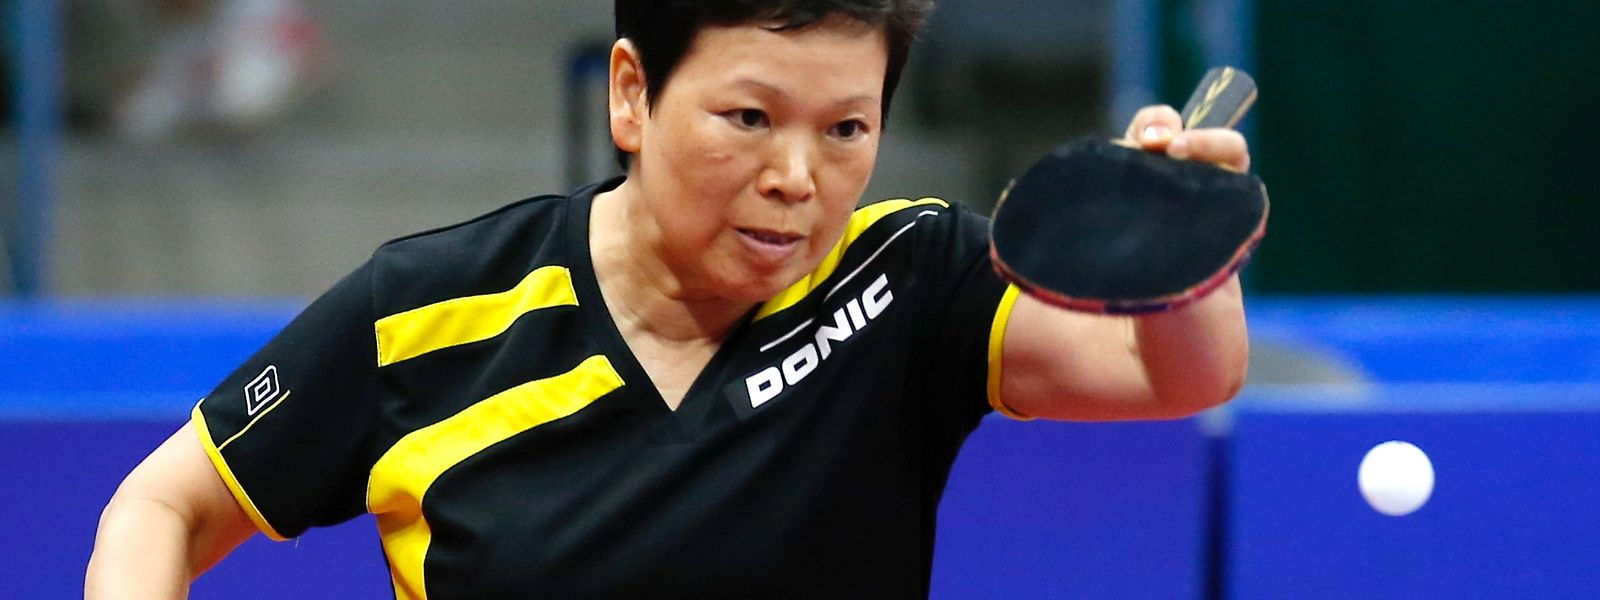 NI Xia Lian hat die Olympia-Qualifikation nicht geschafft.